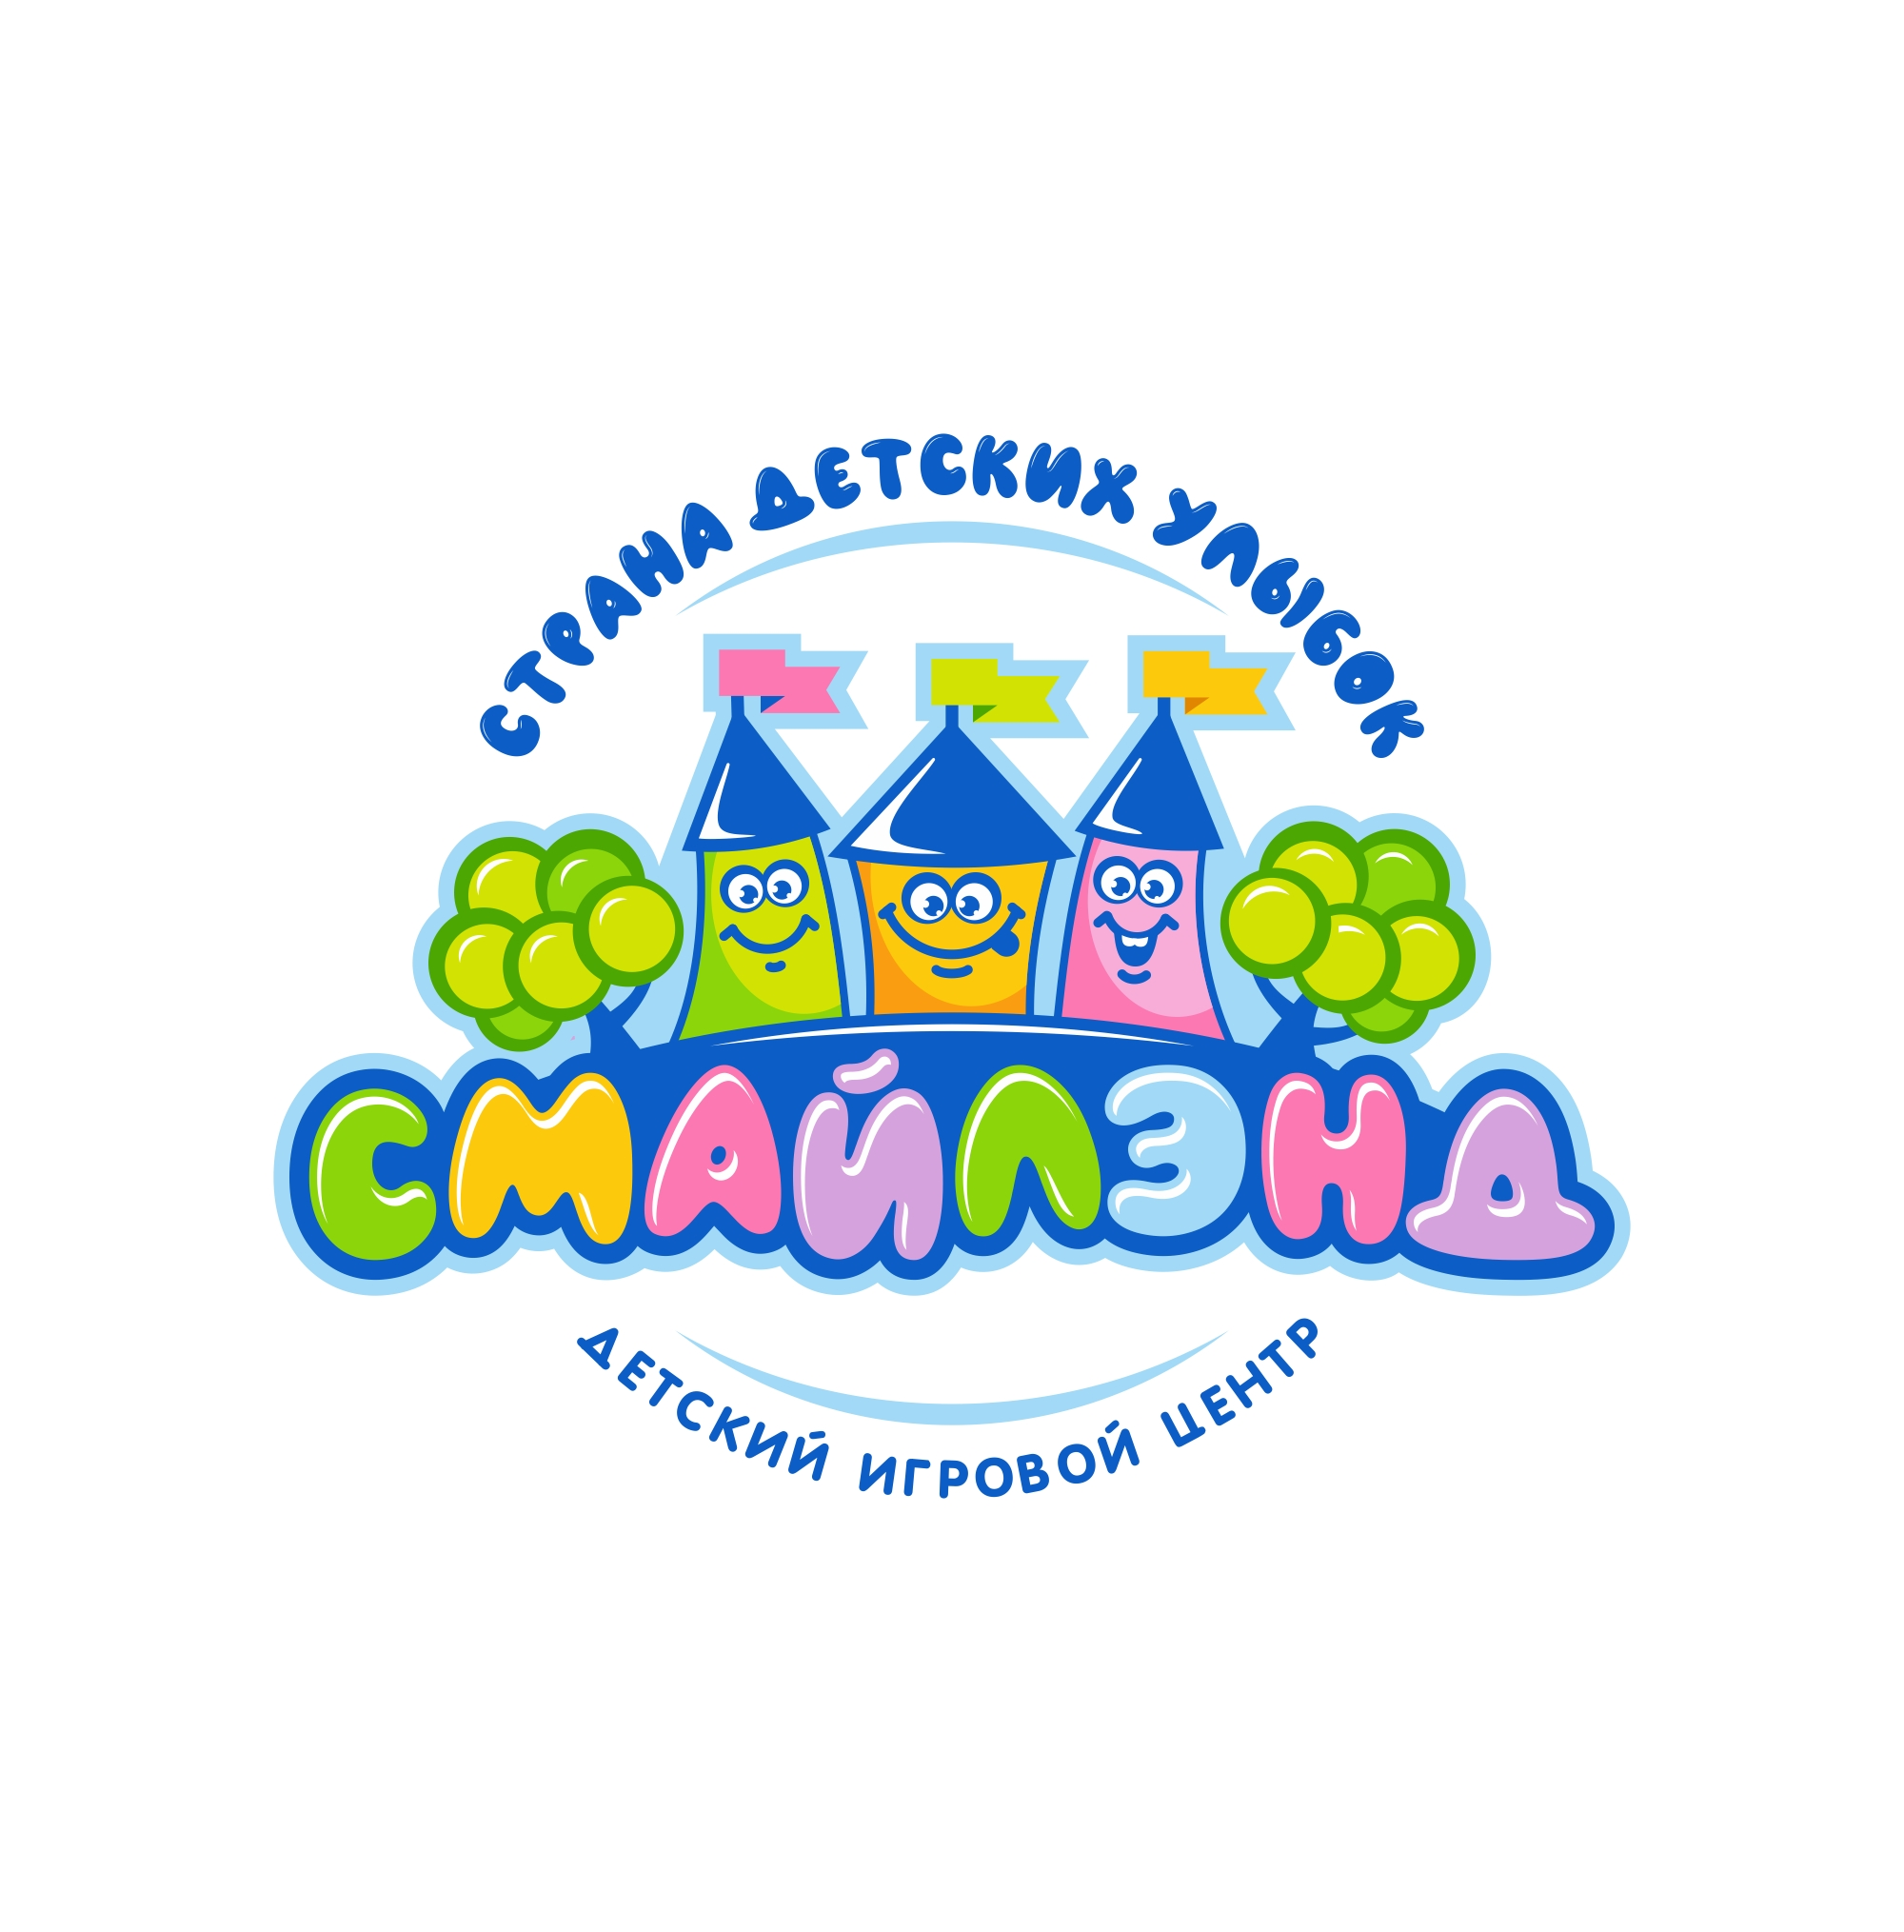 Логотип, стиль для детского игрового центра. фото f_0225a3f6a361c9b3.jpg